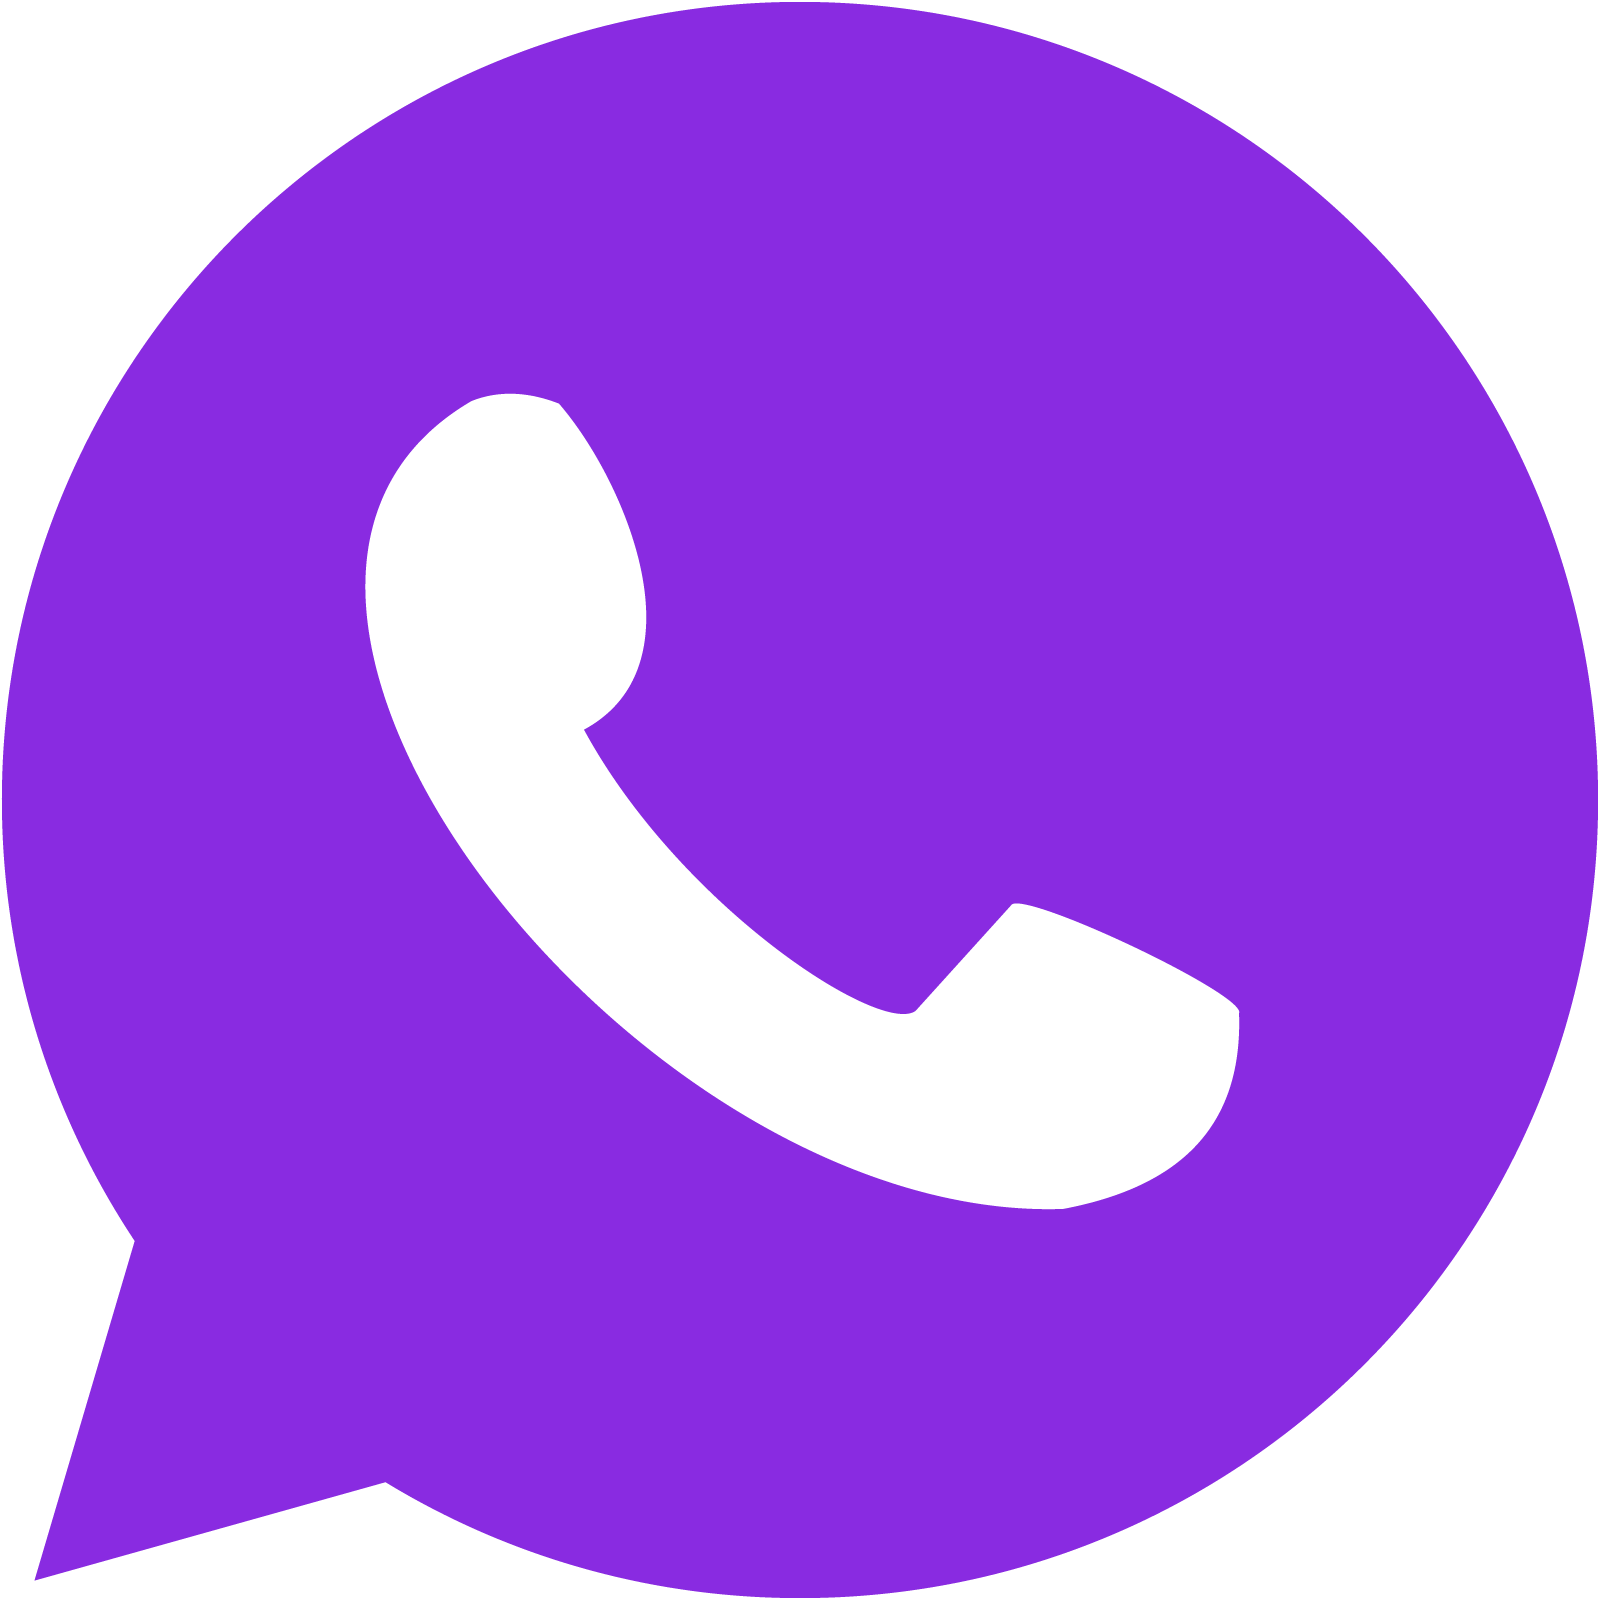 Envio de Whatsapp